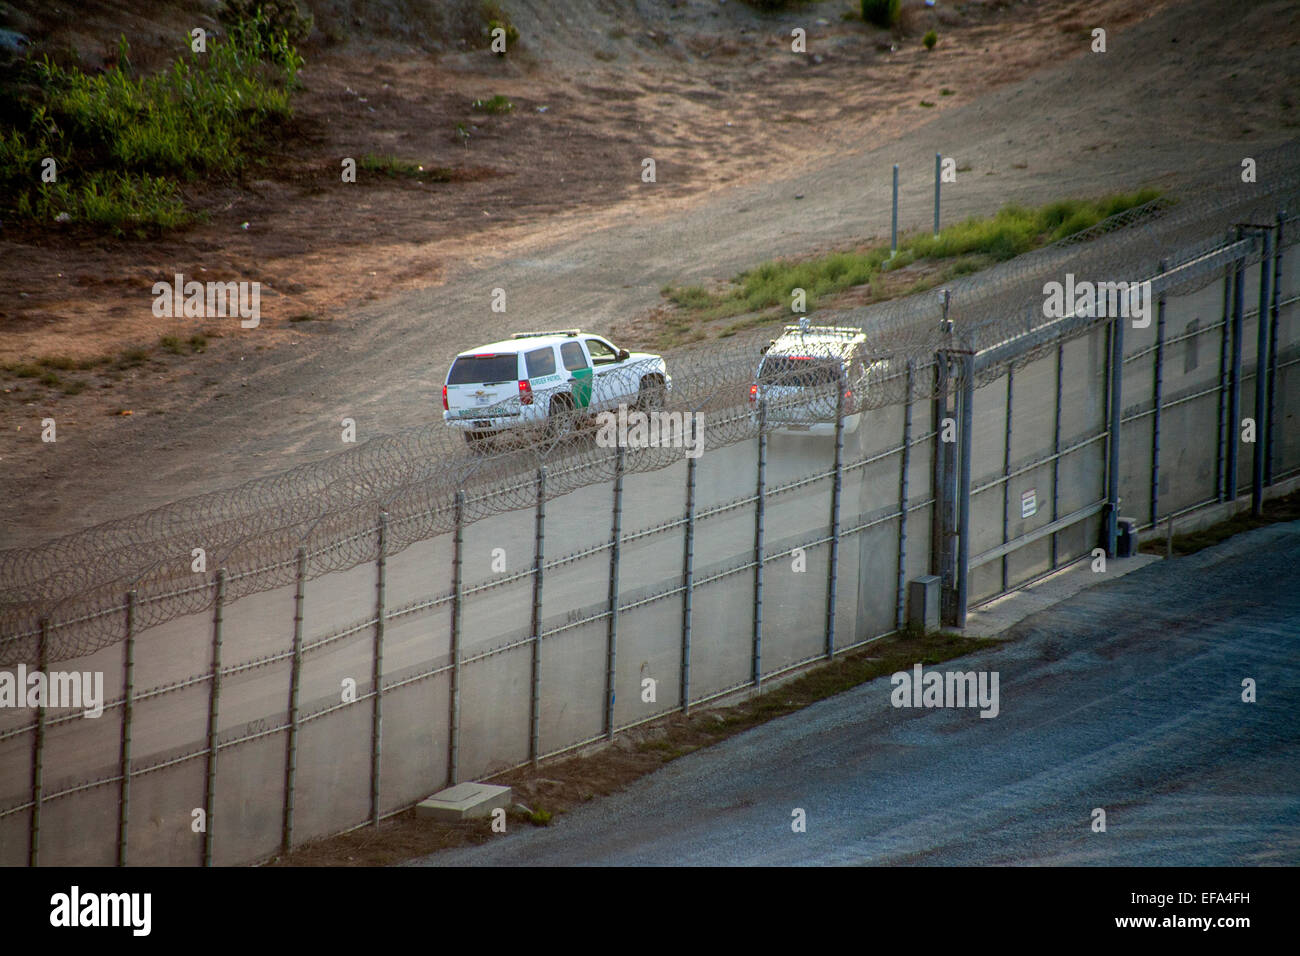 Two Border Patrol SUVs police the U.S./Mexico Border near Tijuana. The Border Patrol is part of the U.S. Department - Stock Image